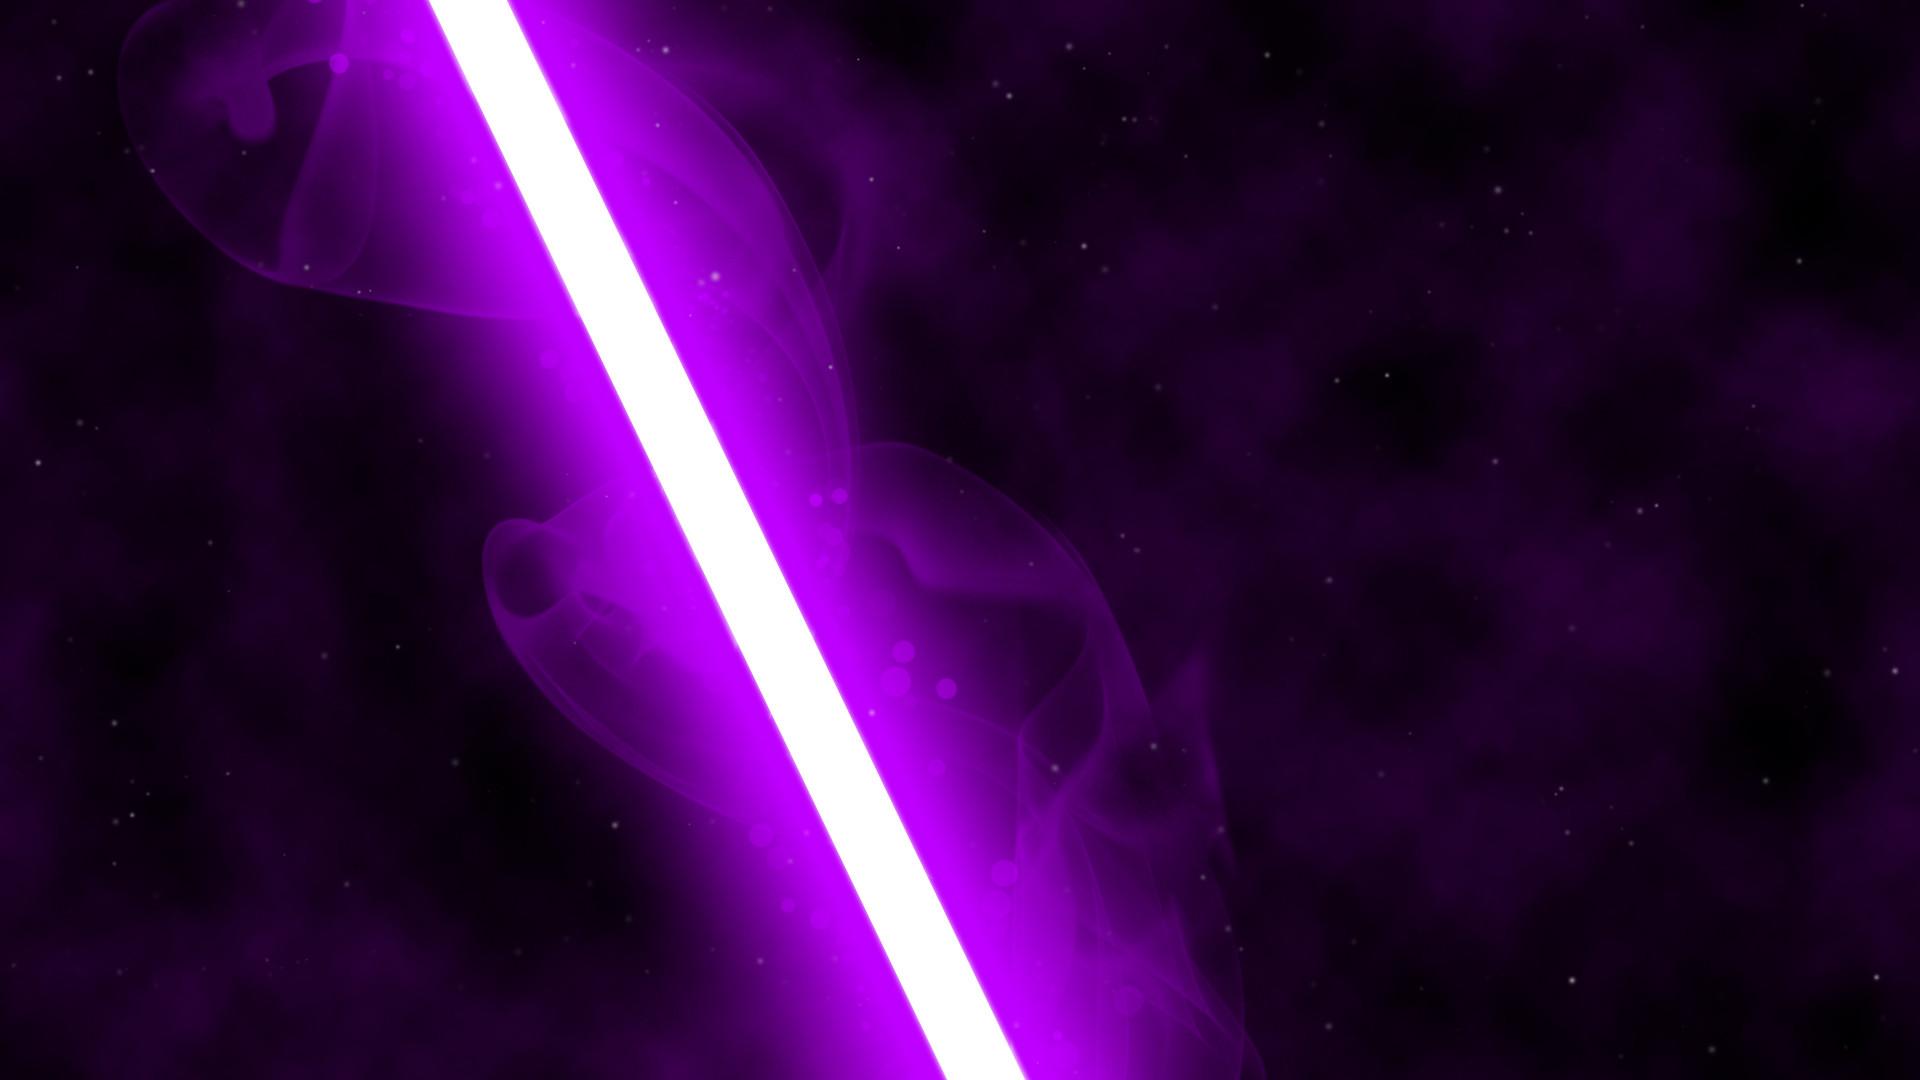 Purple Lightsaber Wallpaper